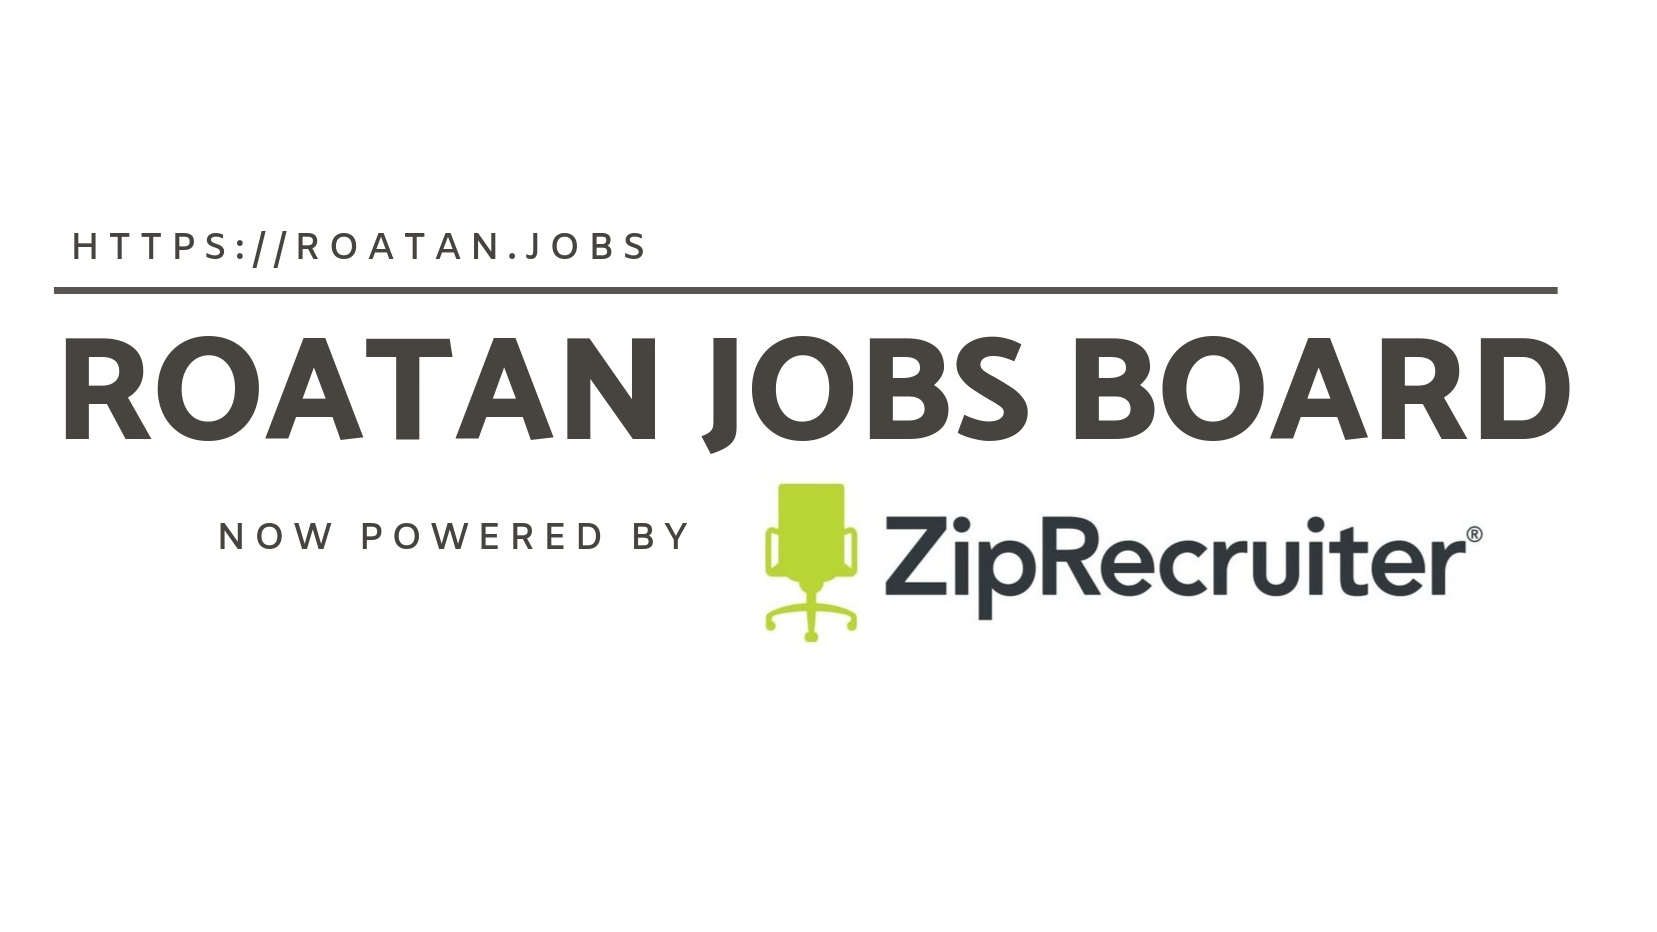 ROATAN+JOBS+BOARD.jpg